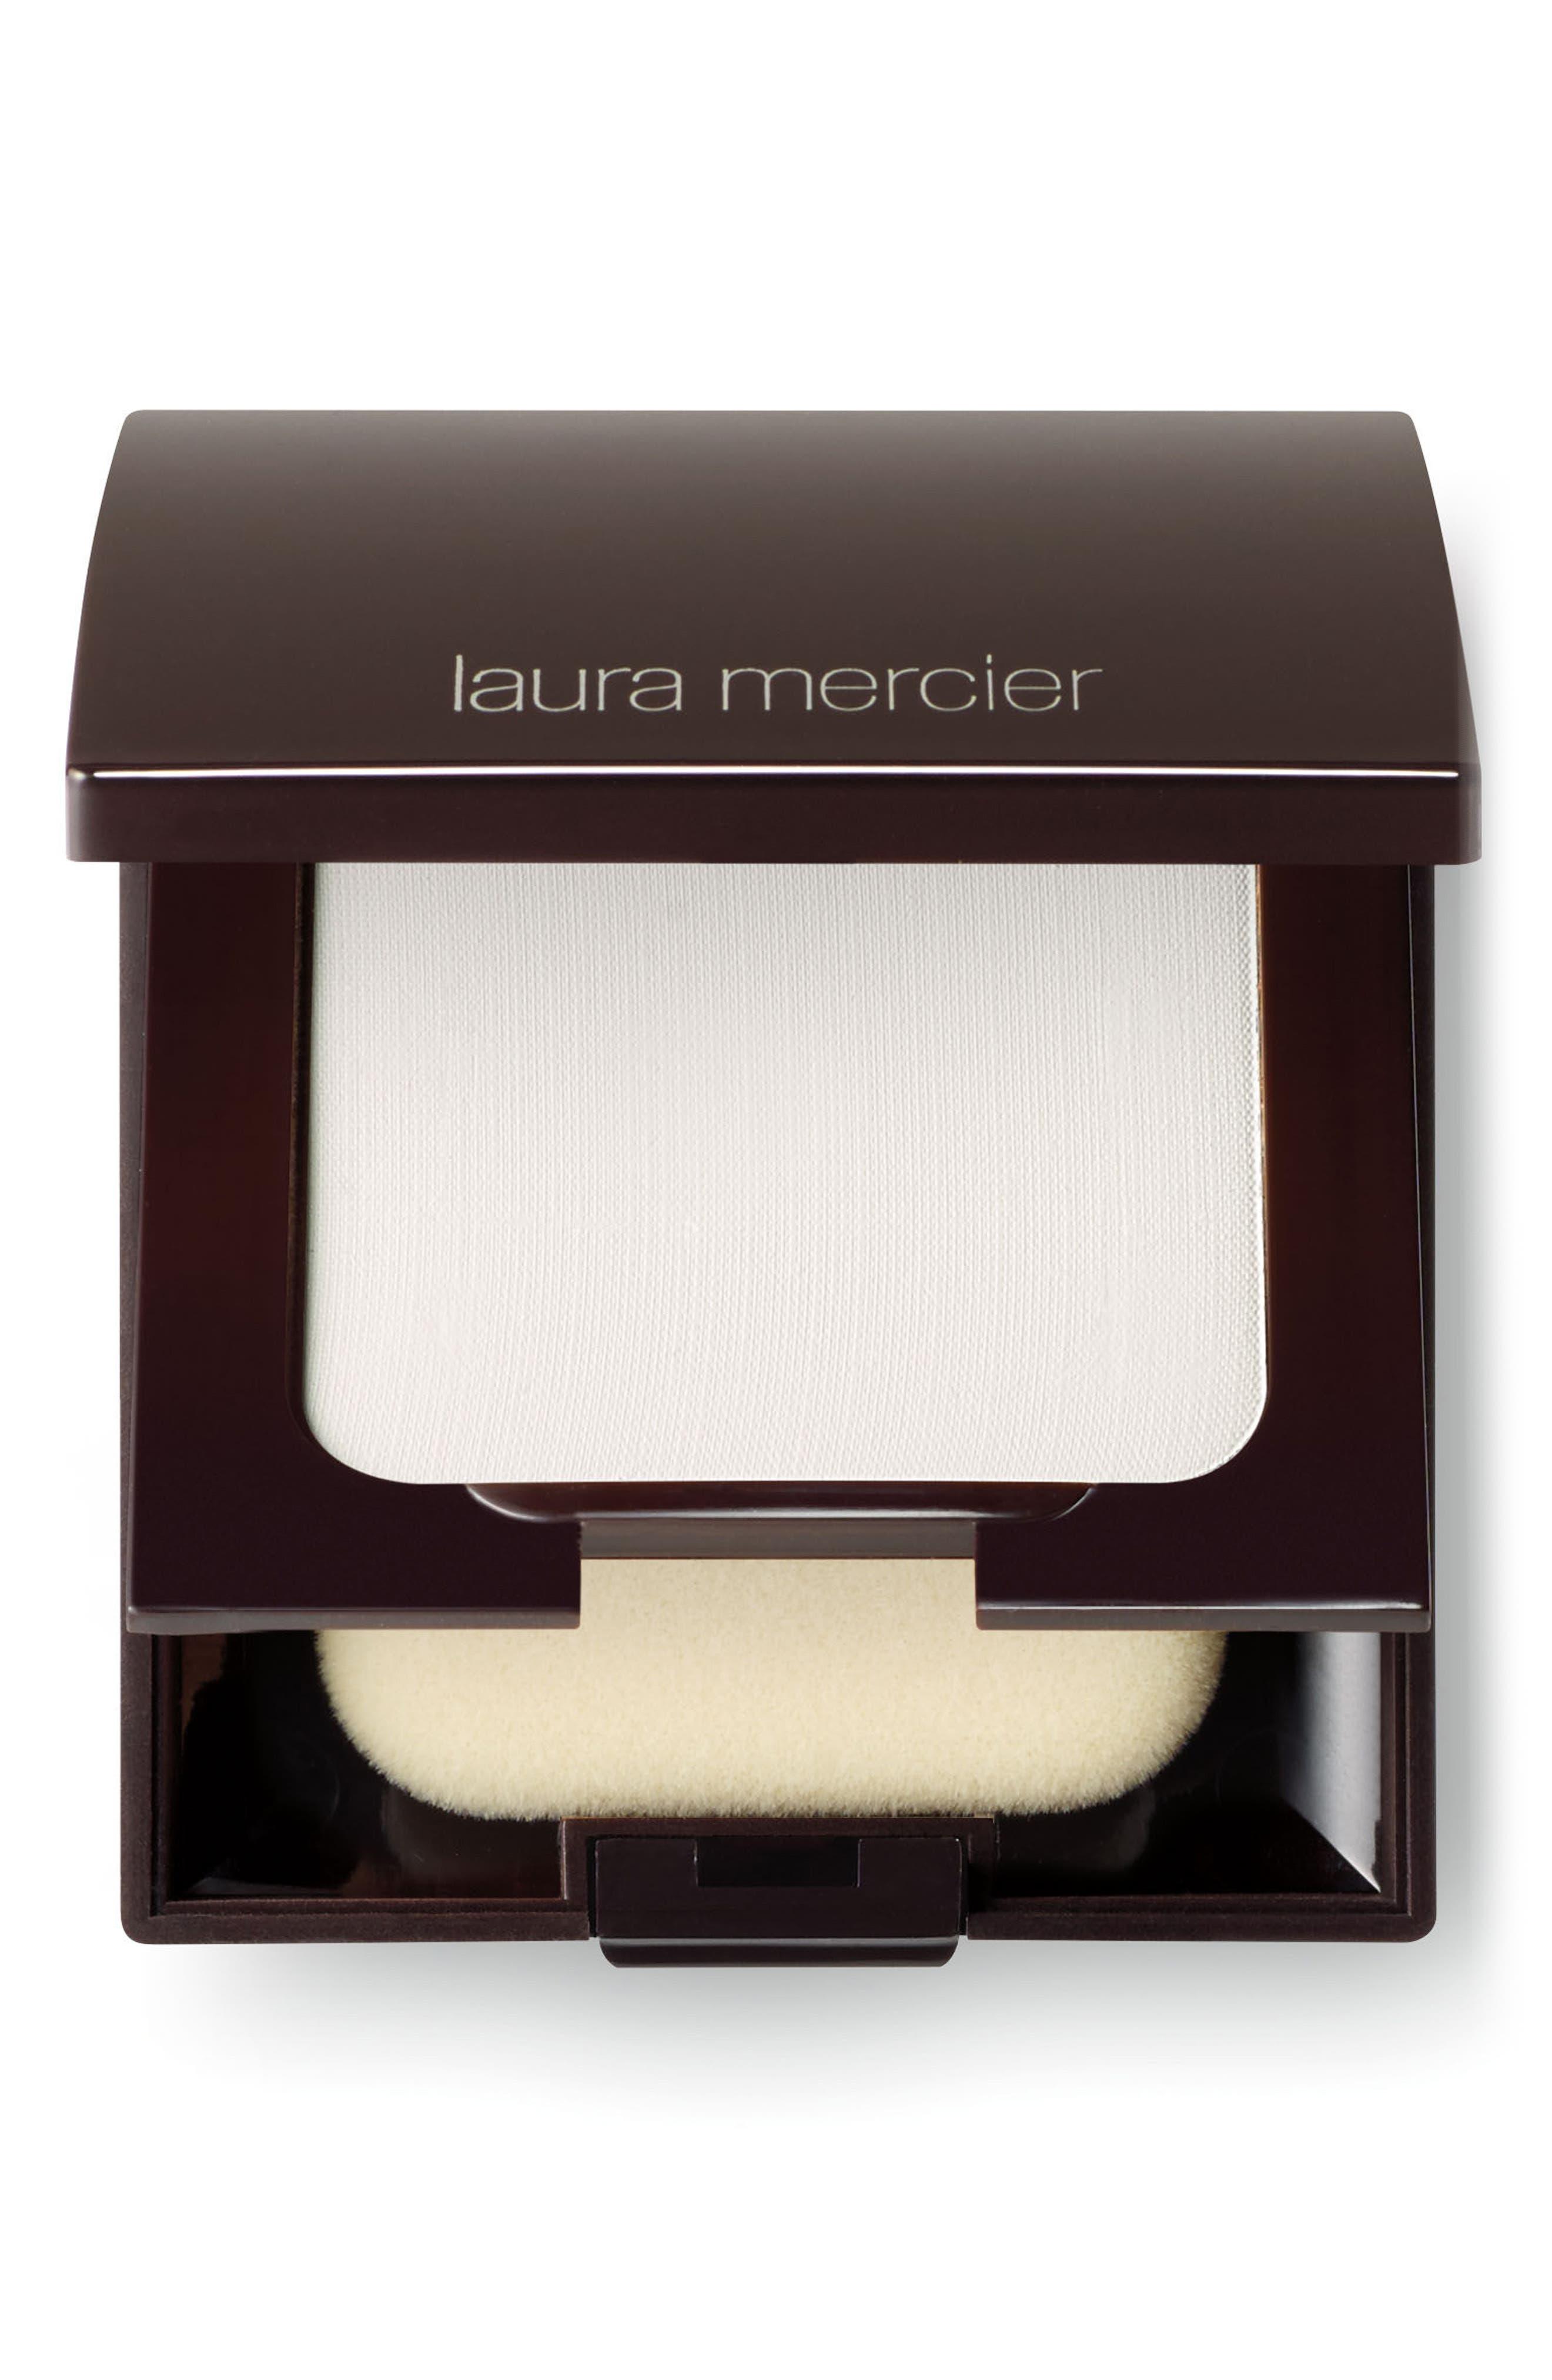 Laura Mercier Invisible Pressed Powder Compact